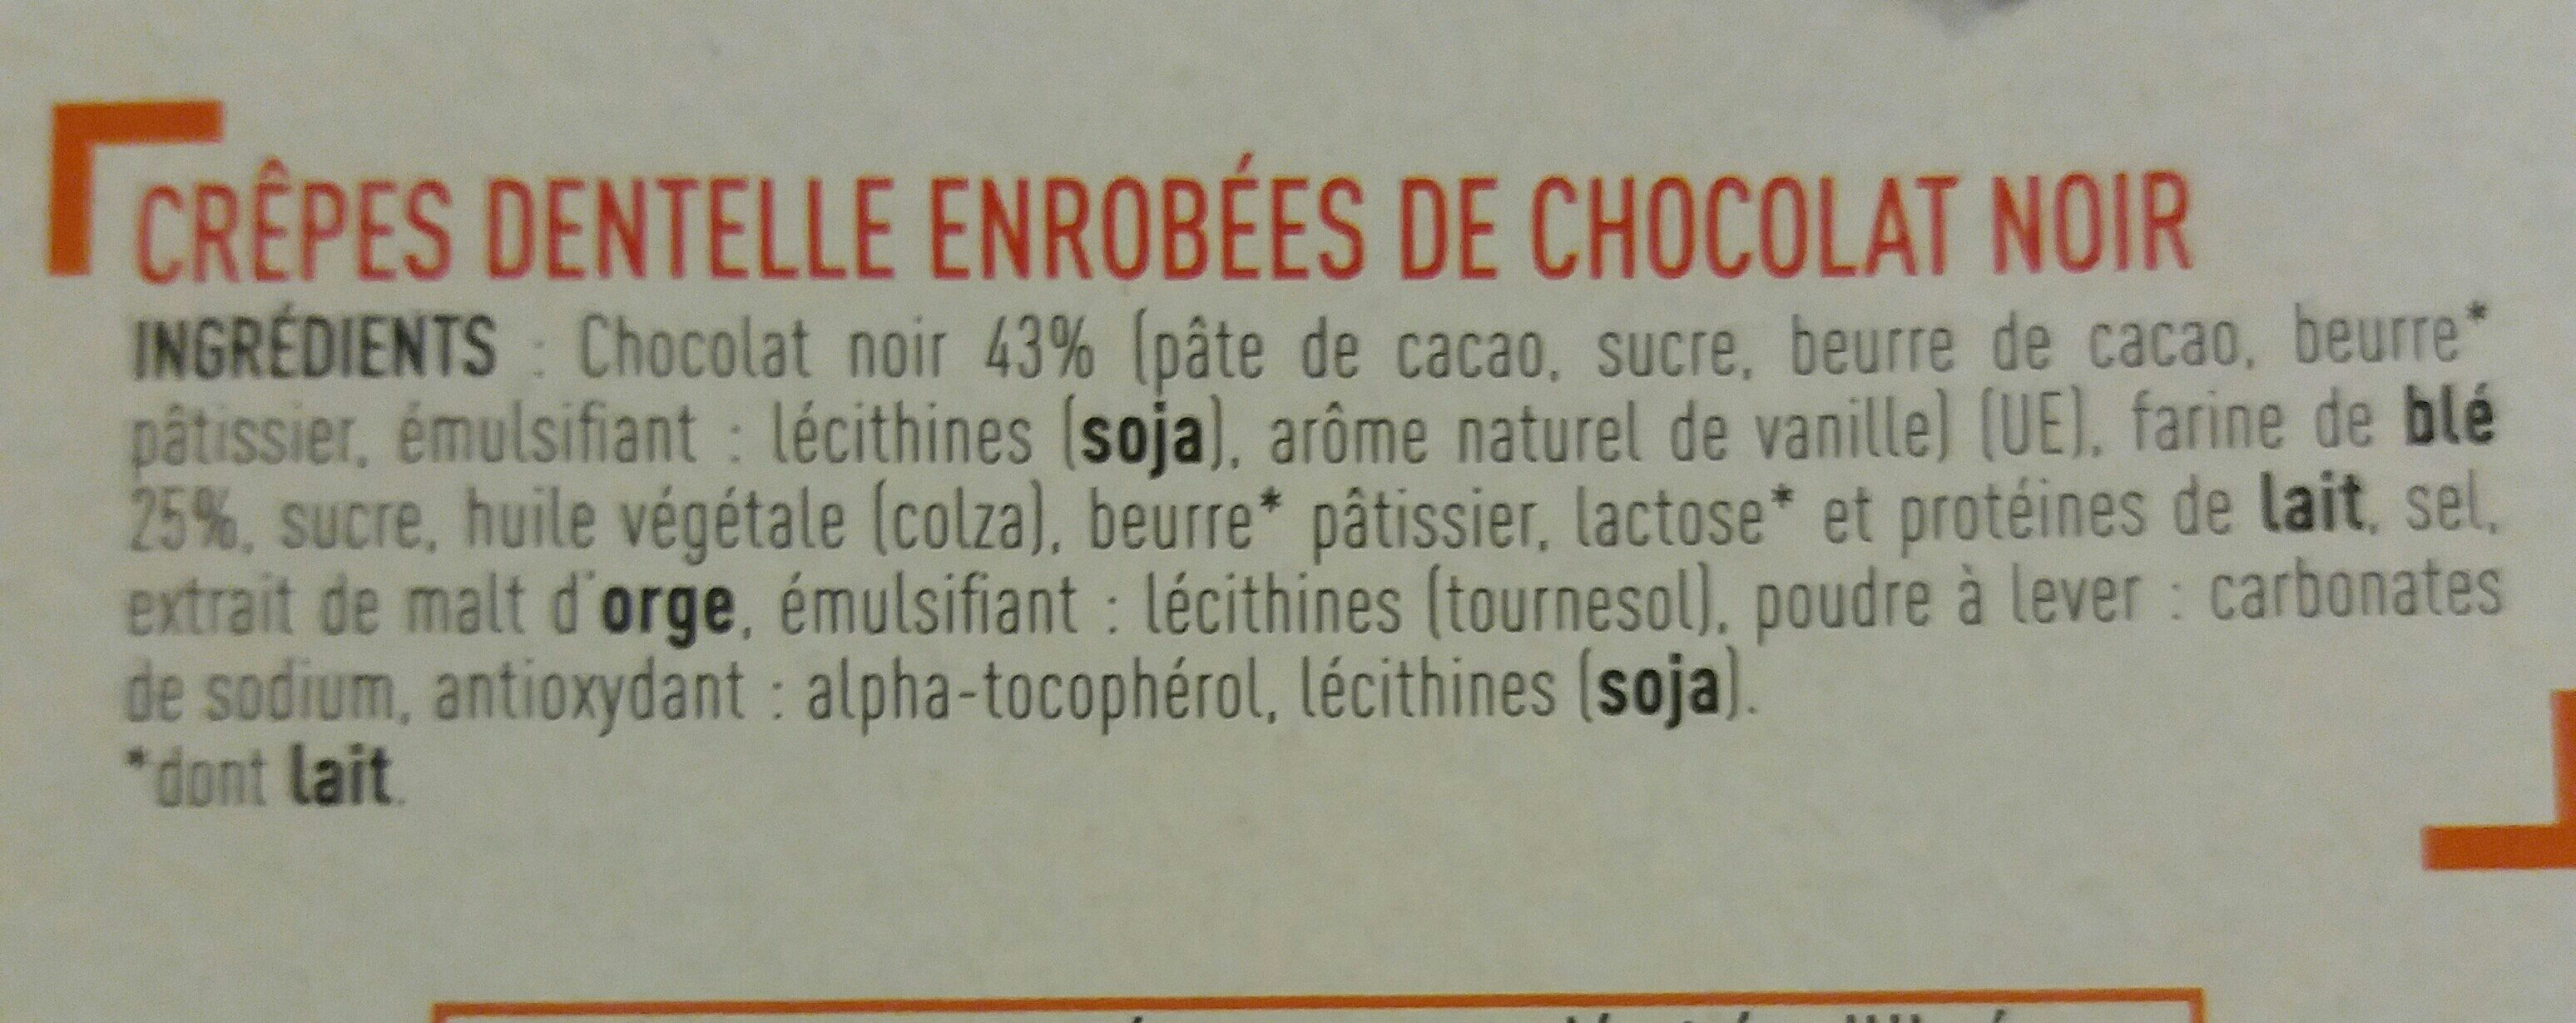 Crêpes dentelle au chocolat noir - Ingrediënten